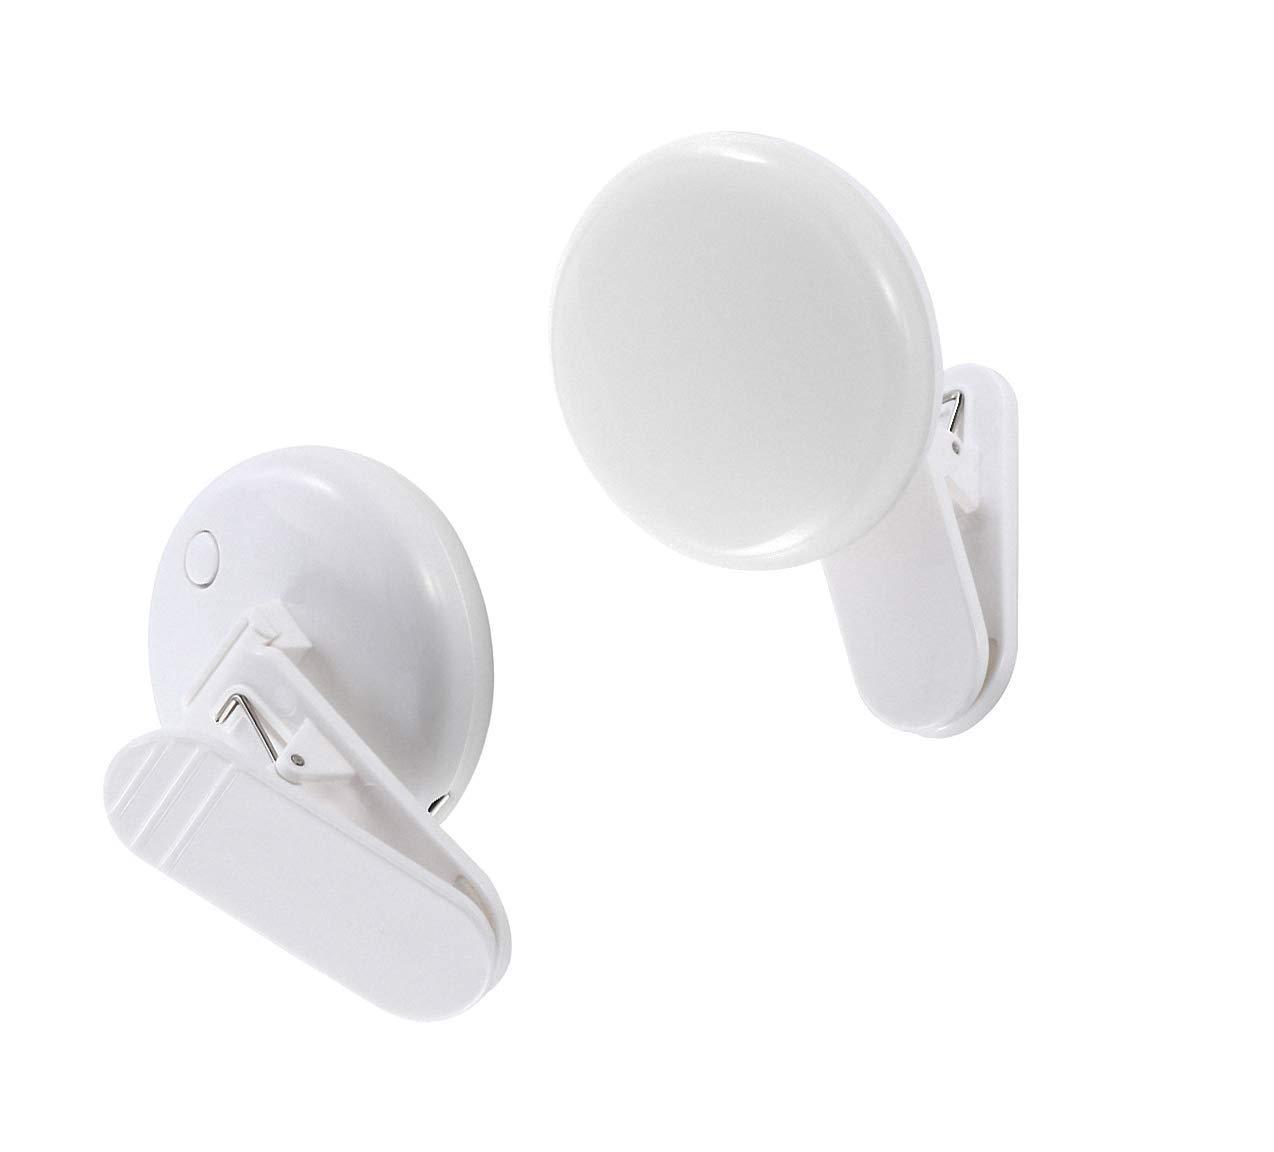 Selfie Ring Light, Rechargeable LED Fill-Light, Portable Clip-on Selfie Camera Light, 3-Level Adjustable Brightness